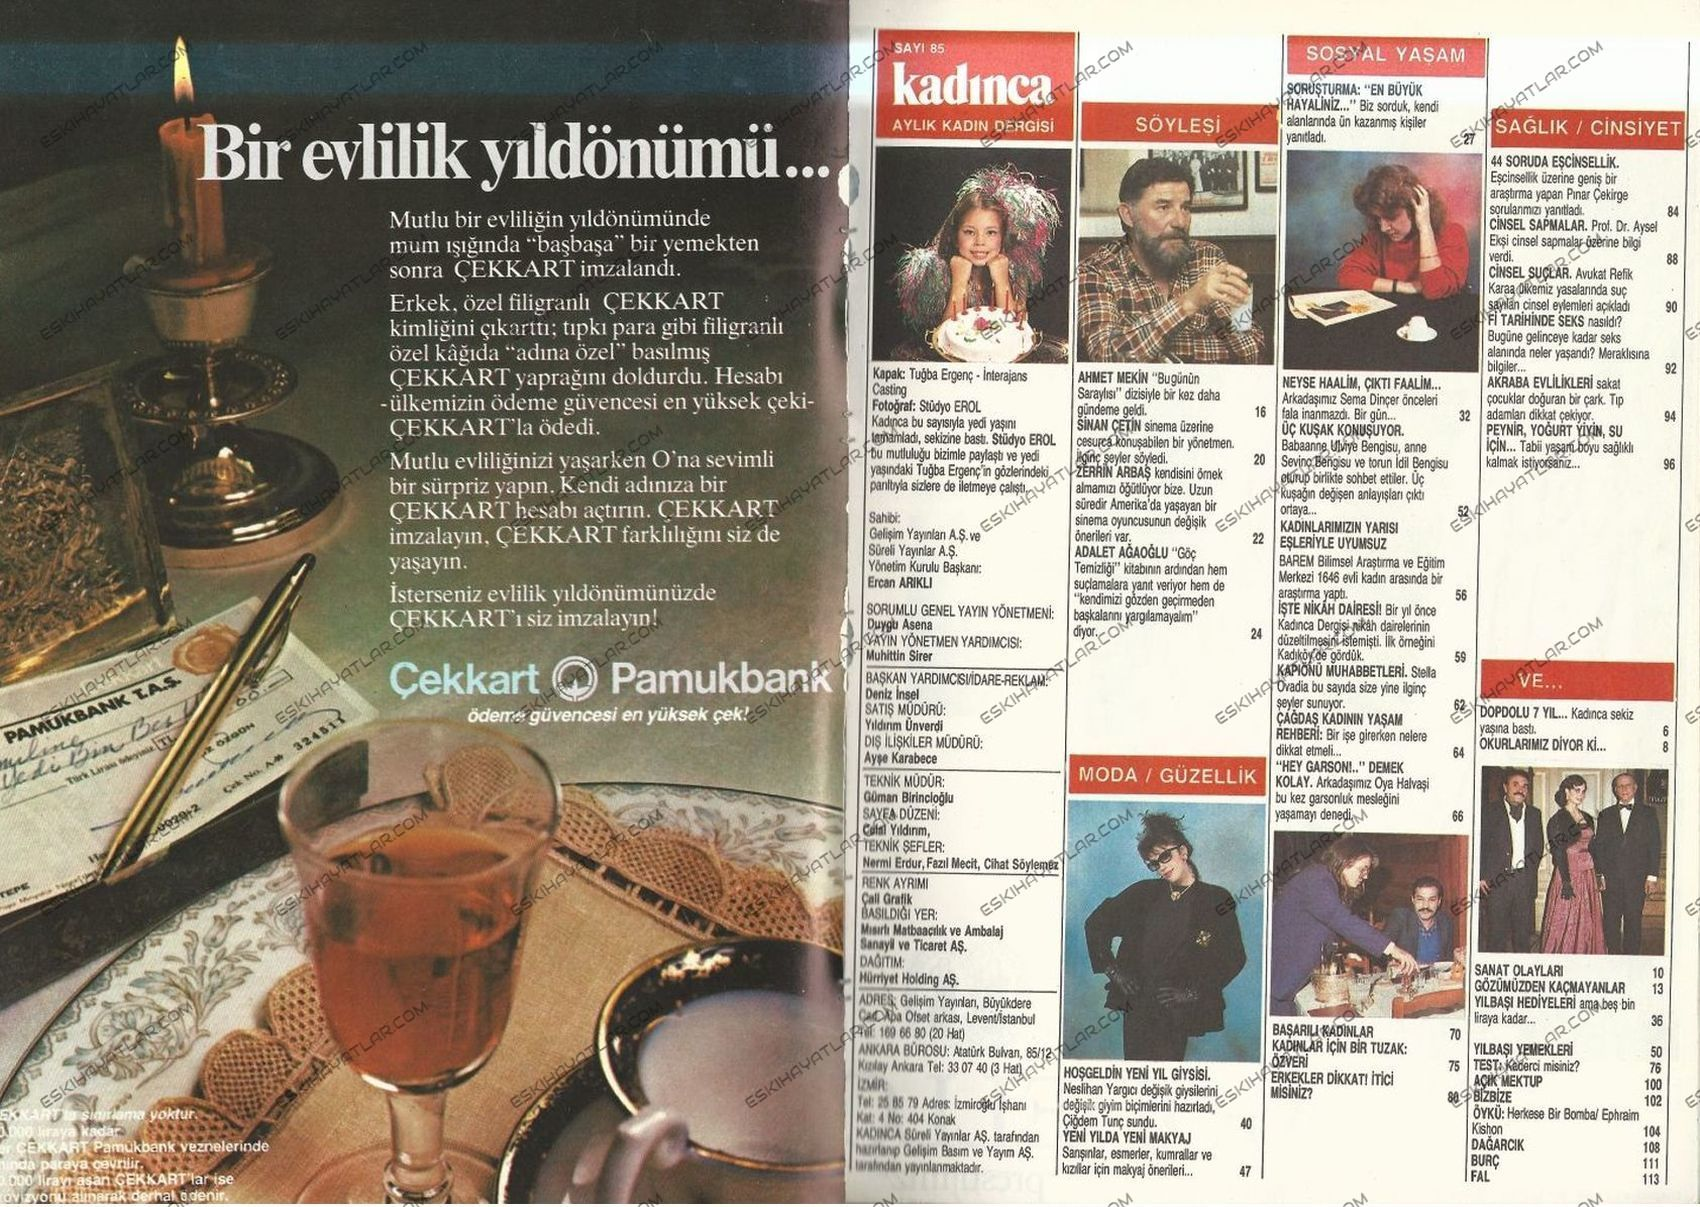 0342-pamukbank-reklami-1985-cek-kart-bir-evlilik-yil-donumu-temali-reklam